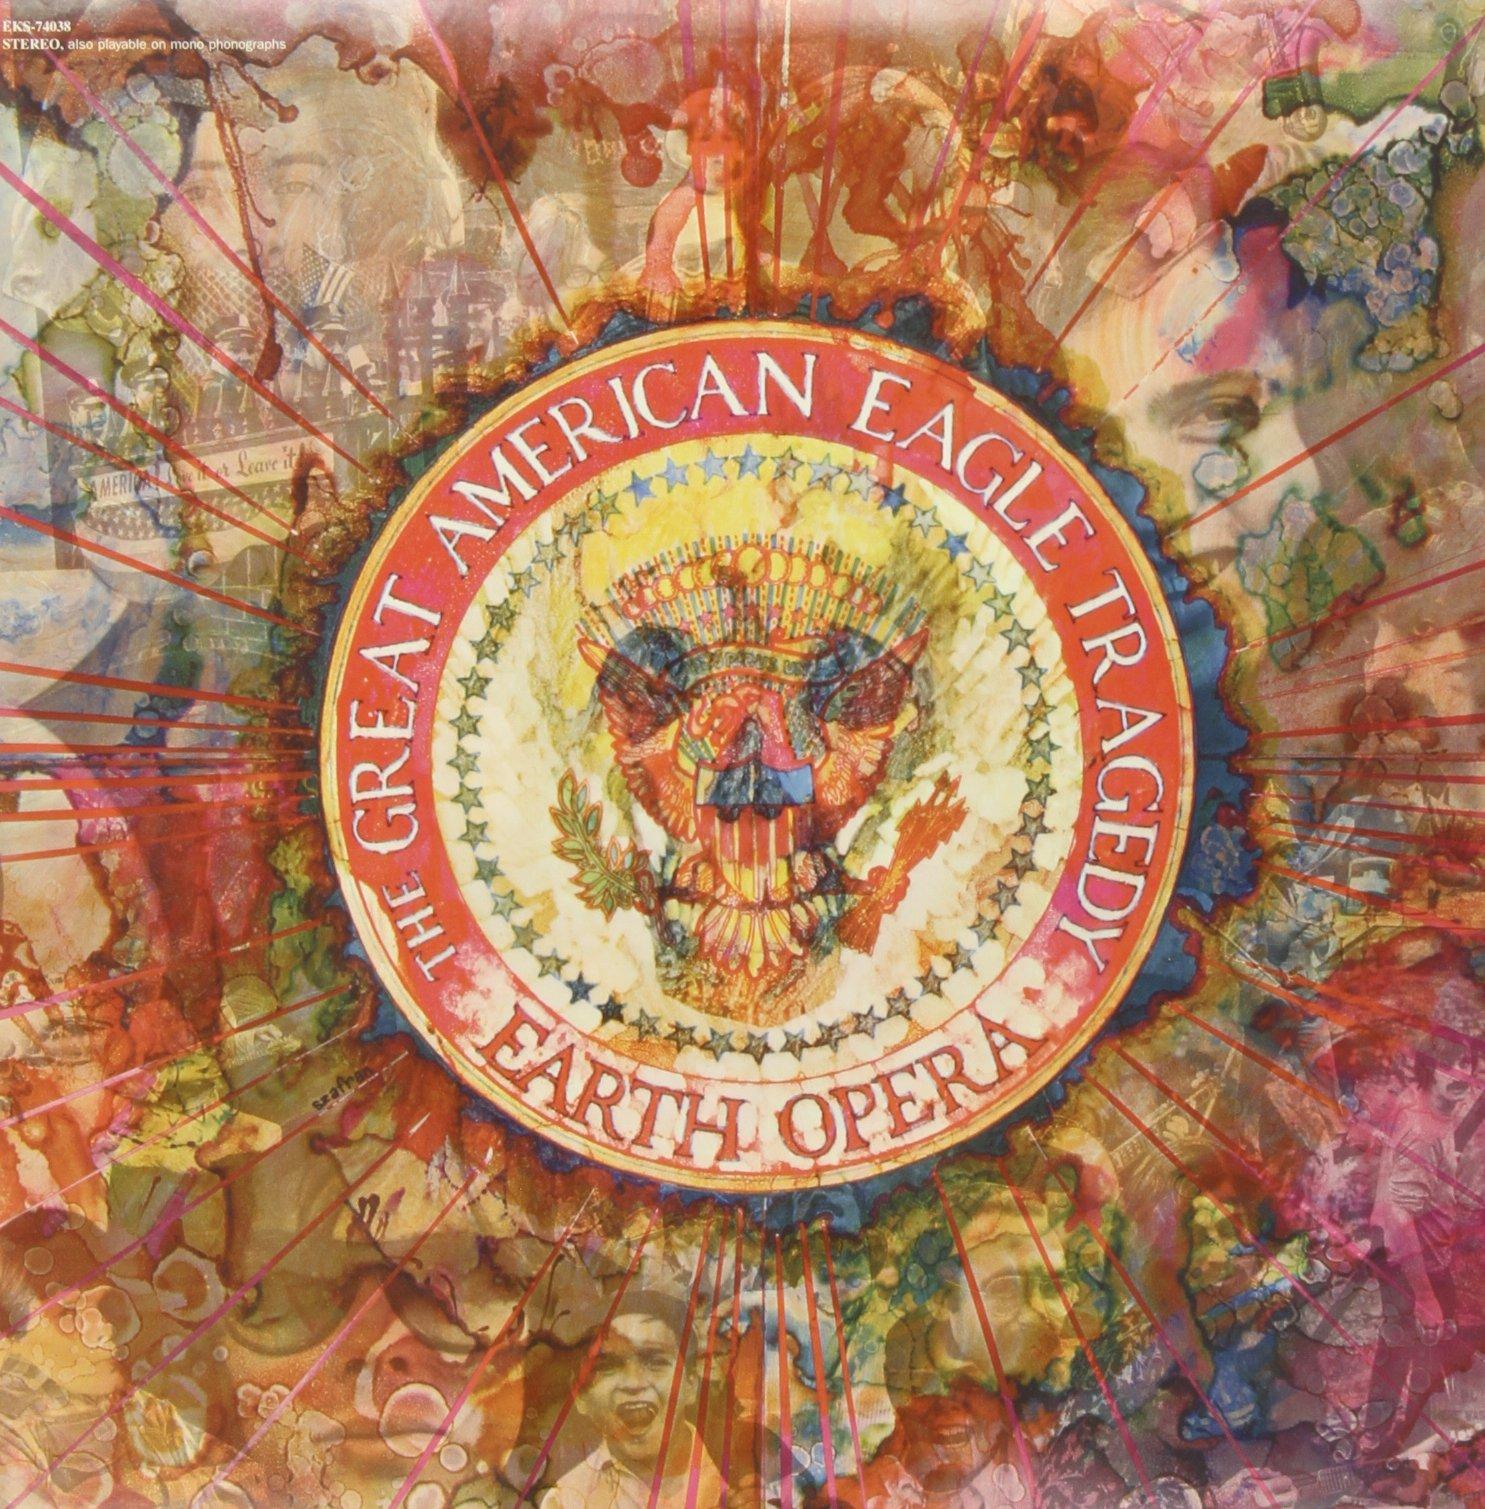 Vinilo : Earth Opera - American Eagle Tragedy (LP Vinyl)